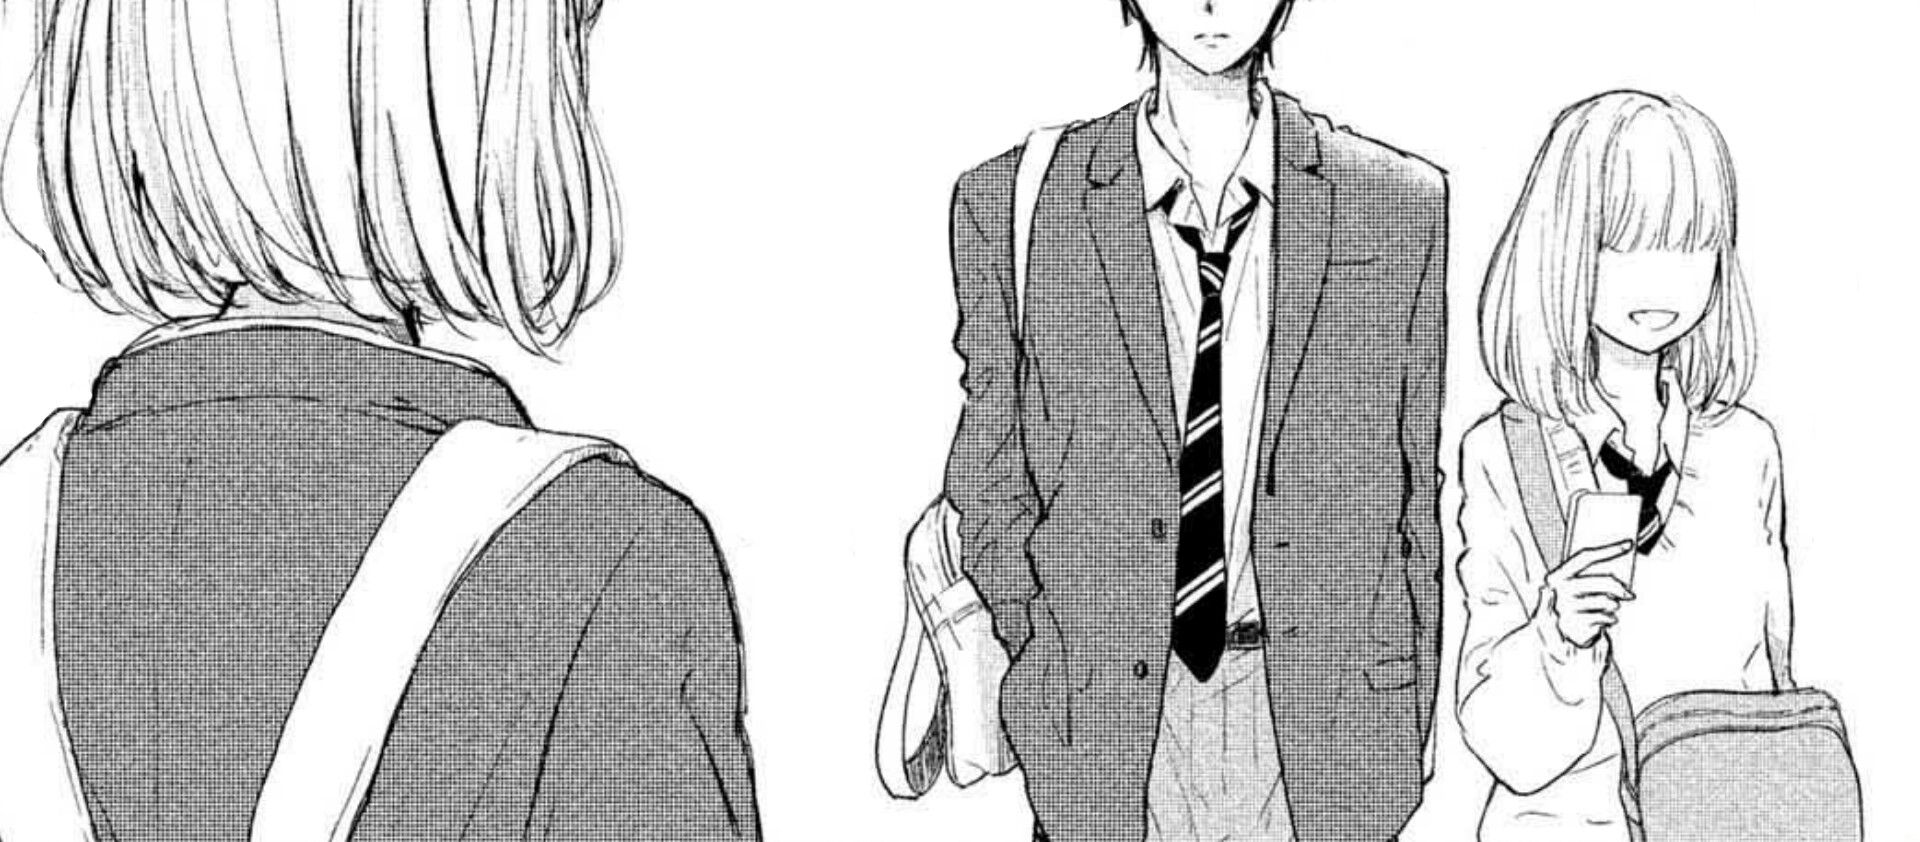 Houkago koishita manga shoujo couple romance love cute style houkago koishita manga shoujo couple romance love cute style fashion tumblr boy and girl sad jealous voltagebd Choice Image